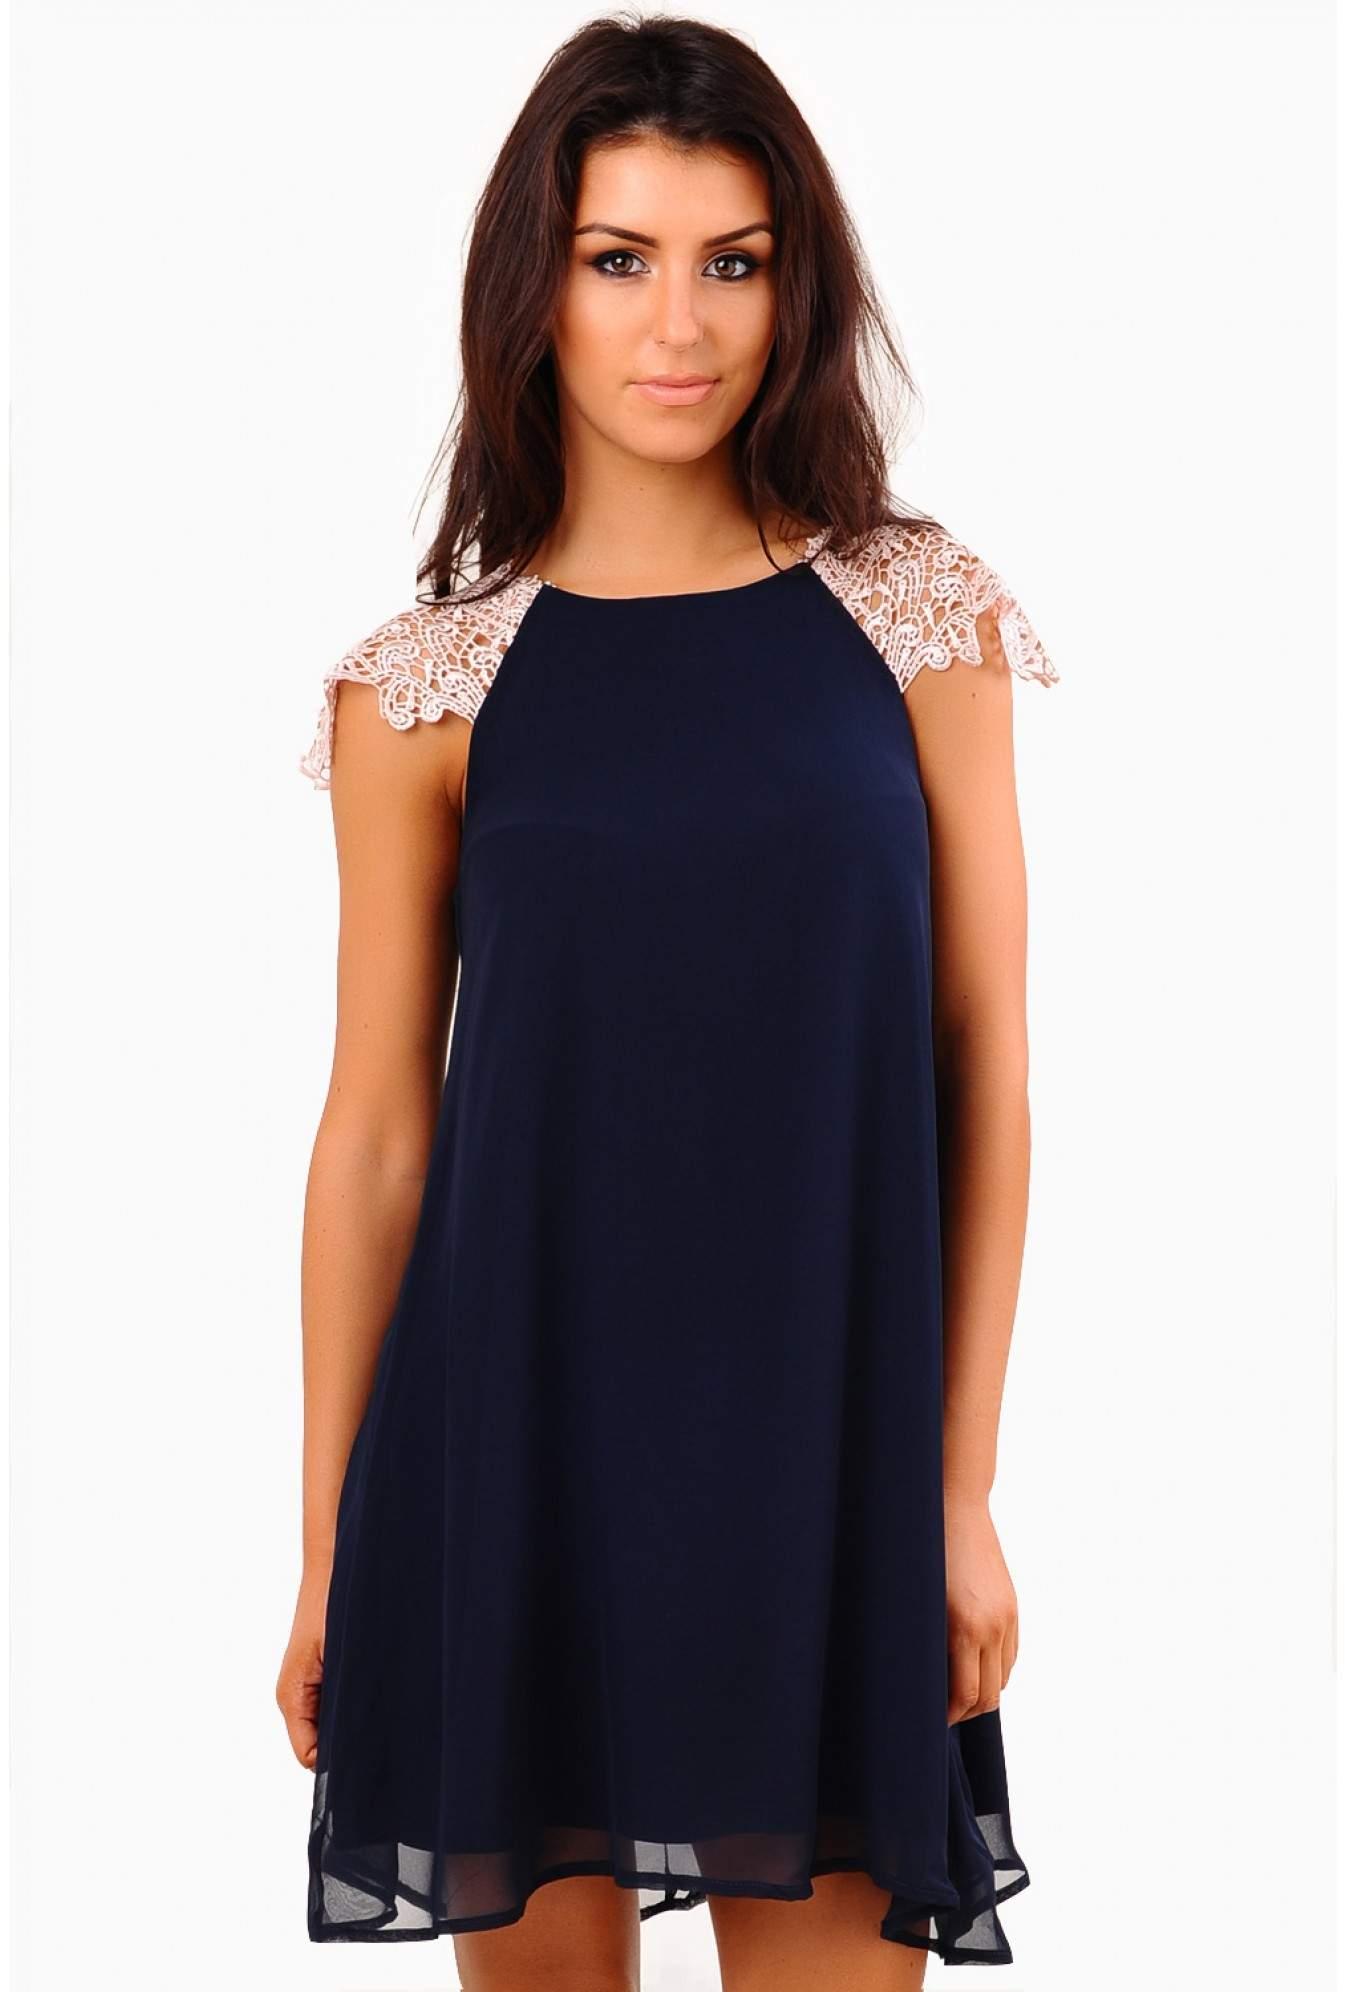 6dcb13b20e41d AX Paris Juliana Crochet Detail Swing Dress in Navy | iCLOTHING